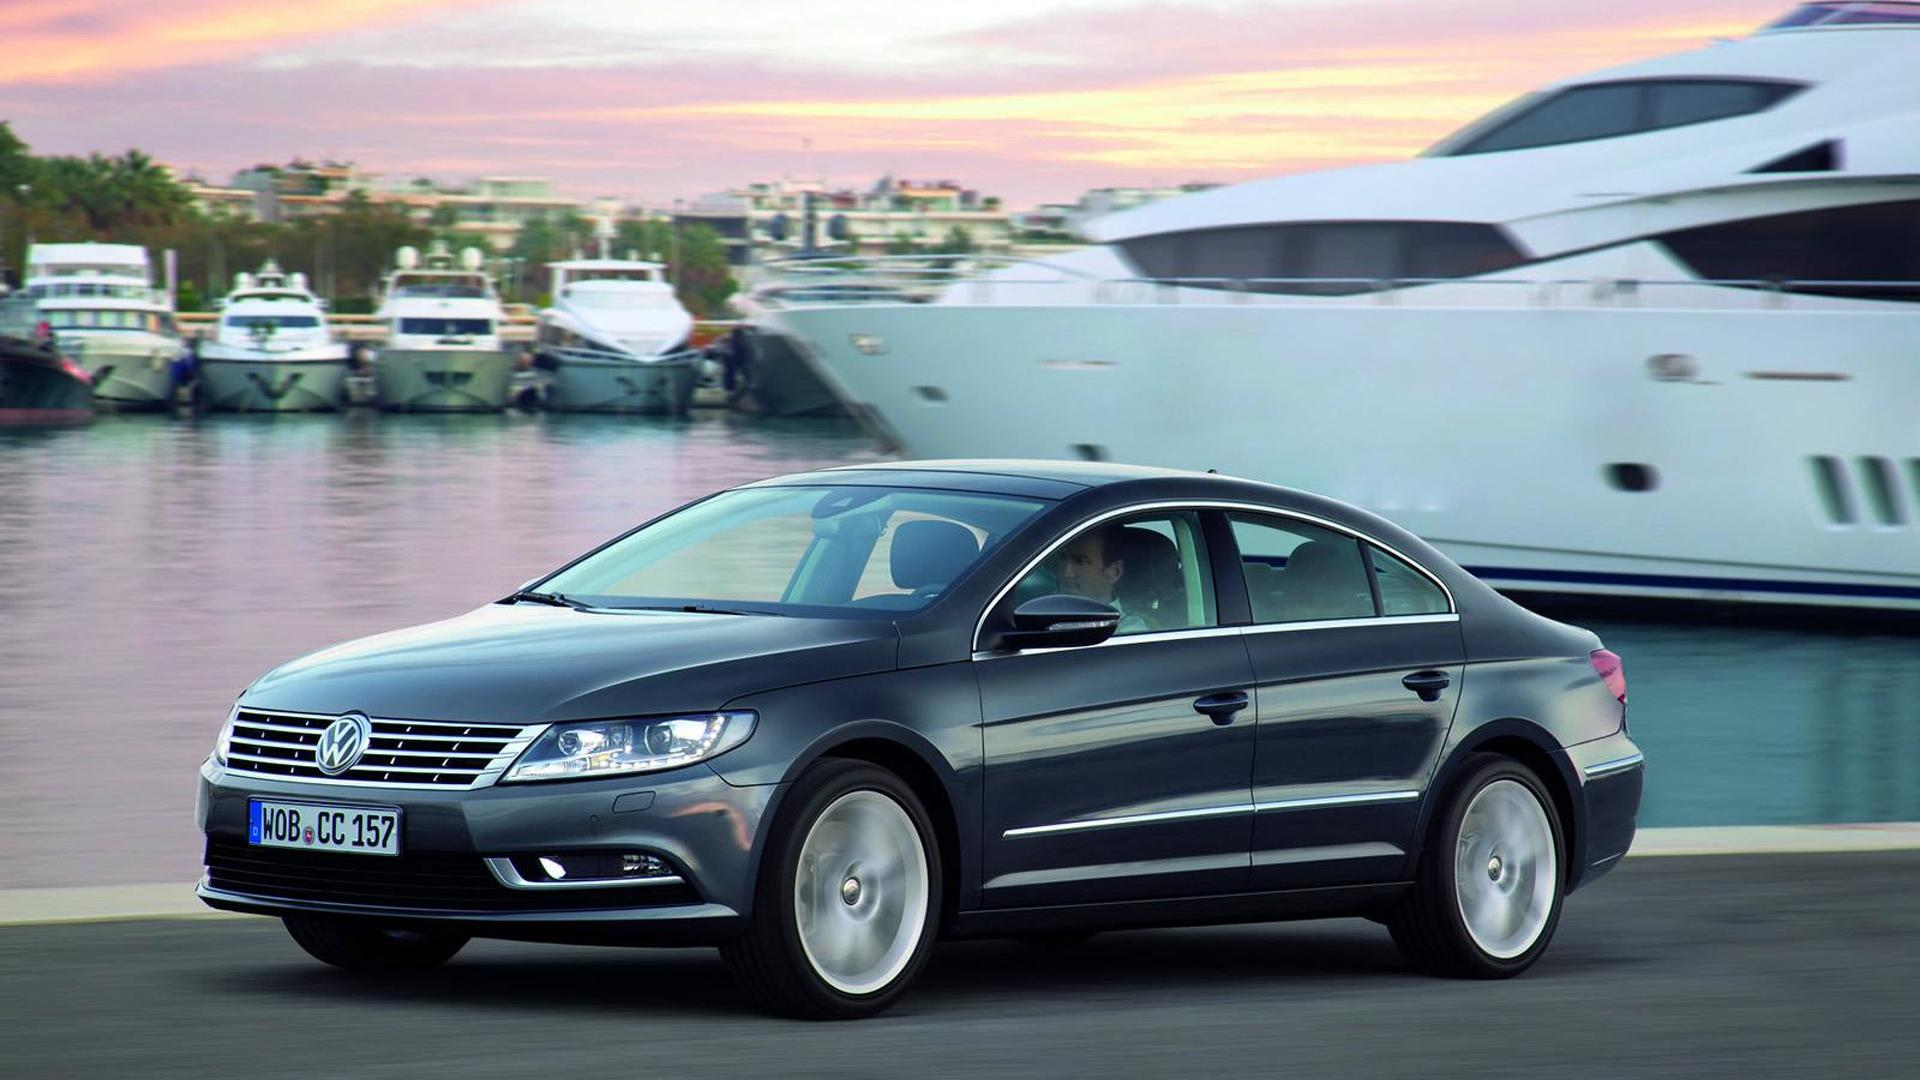 Mini Volkswagen CC under consideration